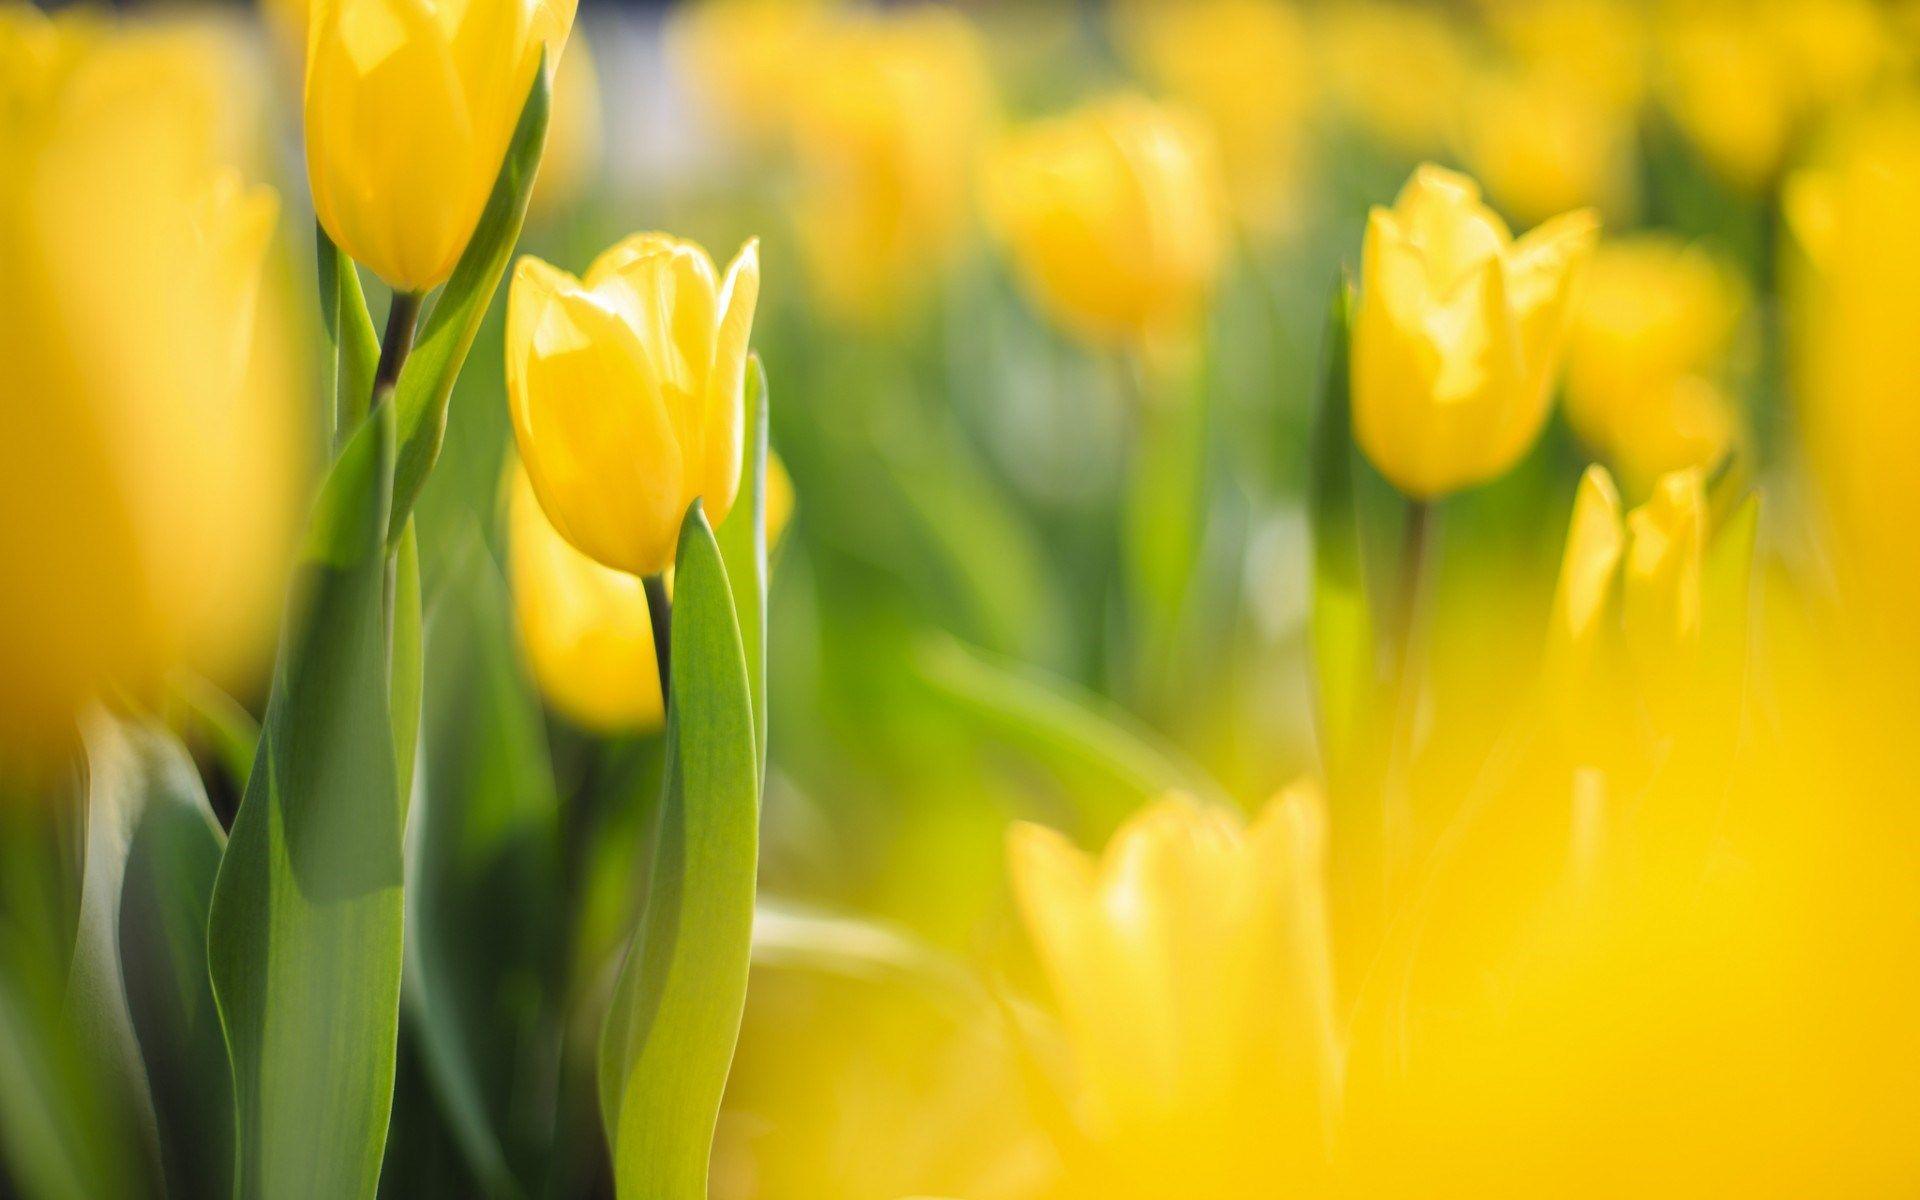 spring flowers yellow tulips Laleler